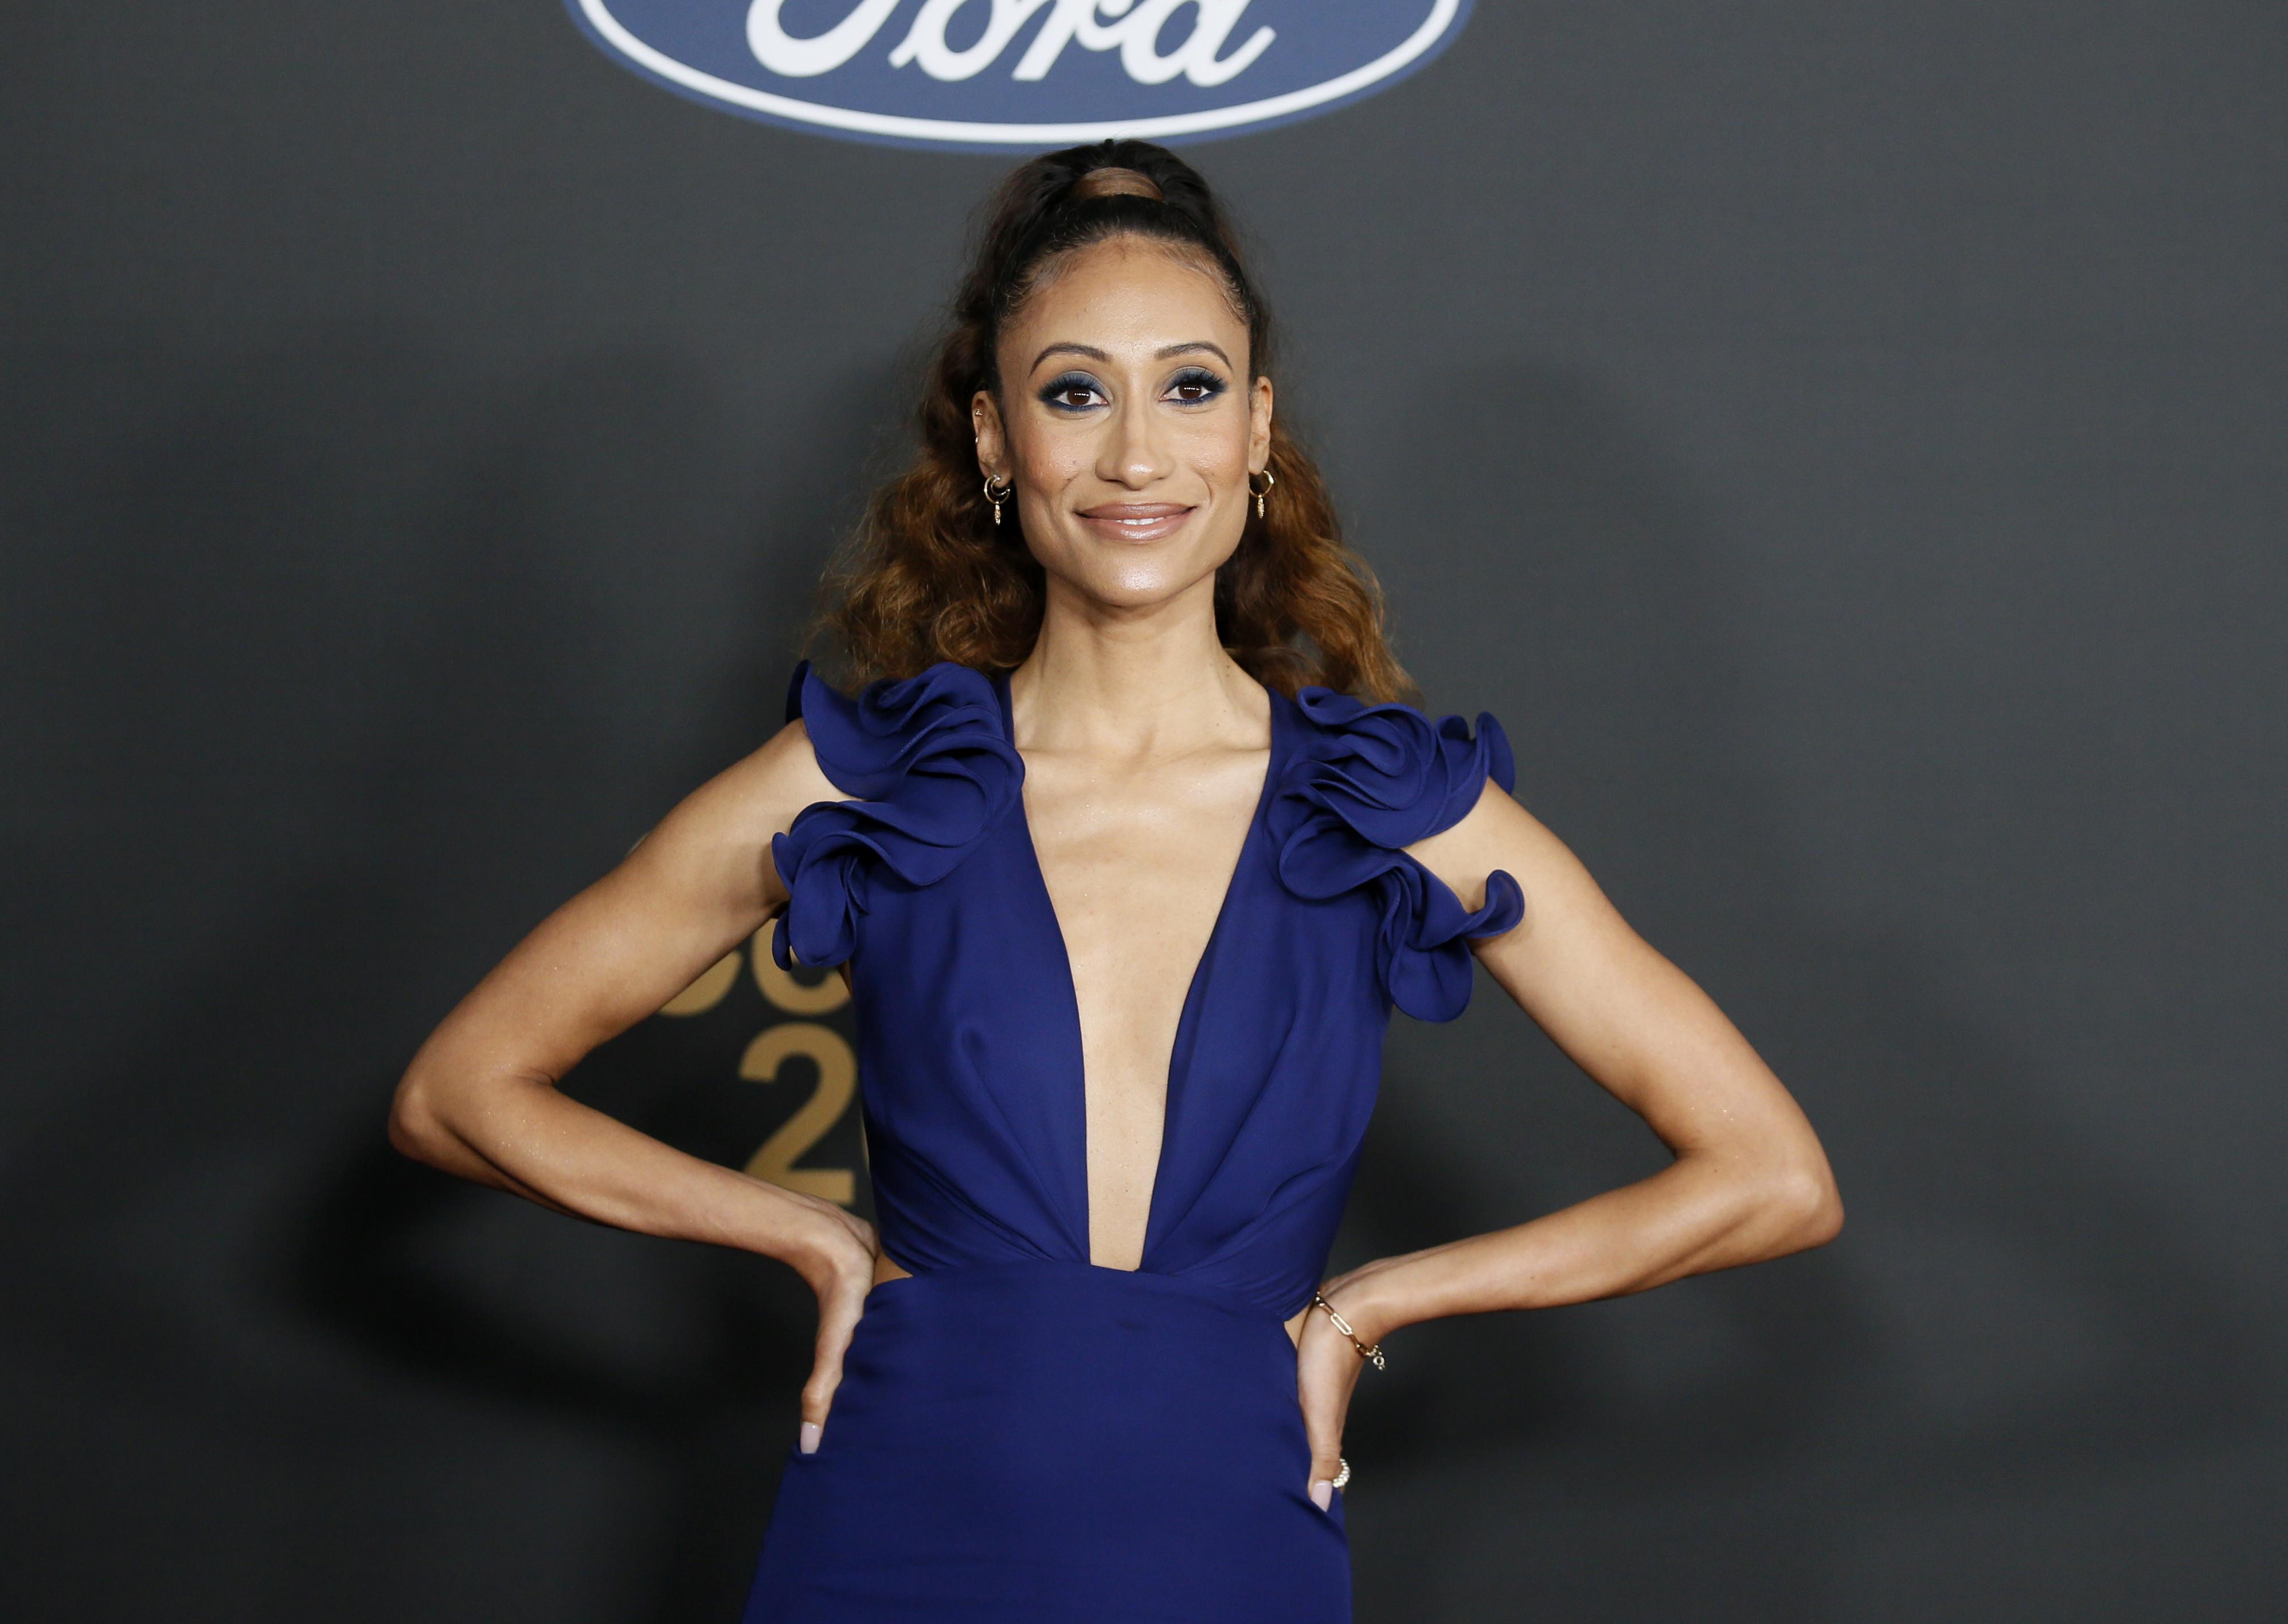 51st NAACP Image Awards - Arrivals - Pasadena, California, U.S., February 22, 2020 - Elaine Welteroth. REUTERS/Danny Moloshok - HP1EG2N04AYGH